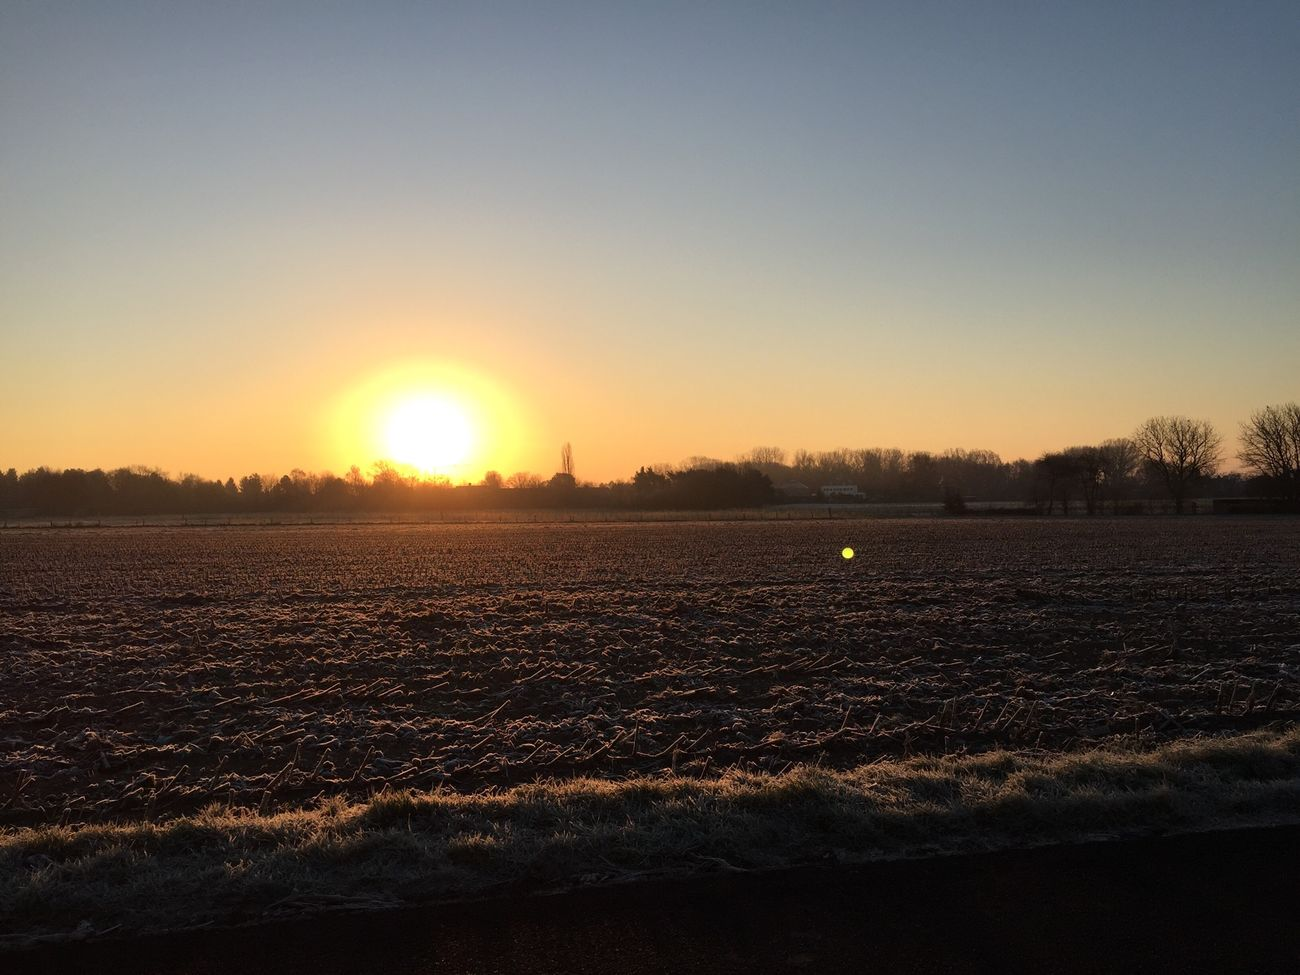 Sunset Nature No Filter Needed Beautiful Day EyeEm Winter Maaseik Belgium